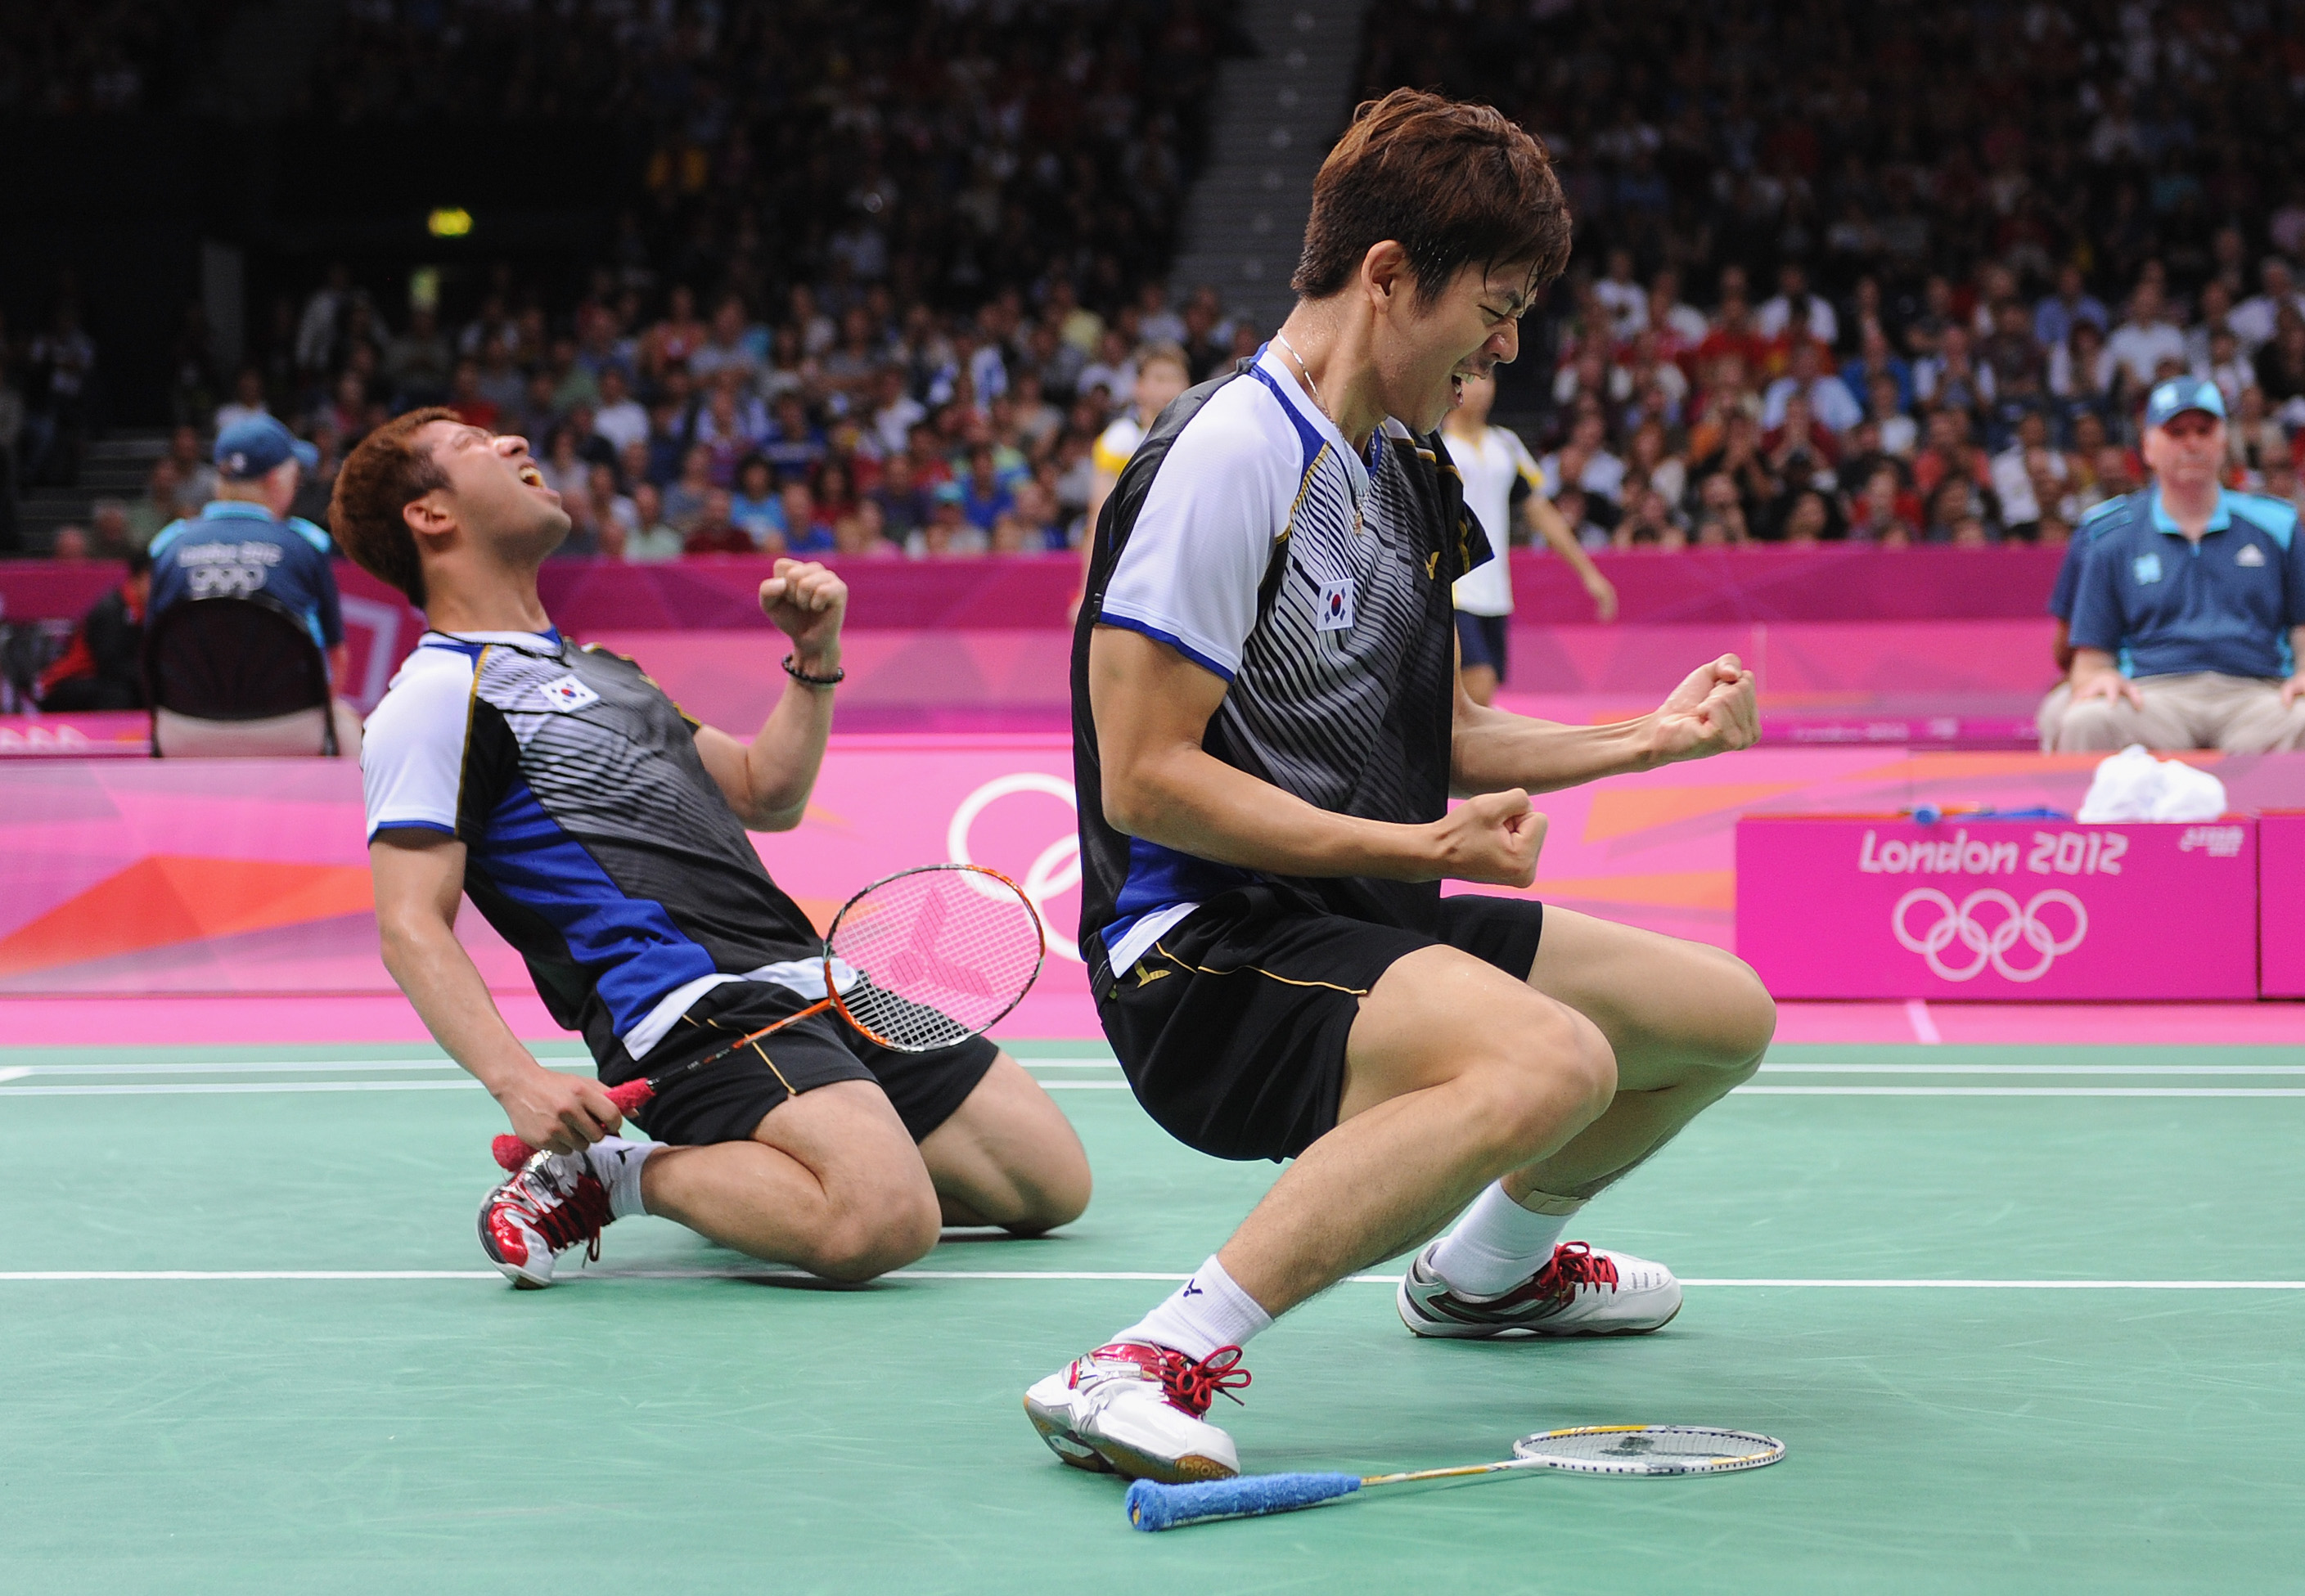 Lee Jae Yong Volleyball Korea's Yong Dae Lee And Jae